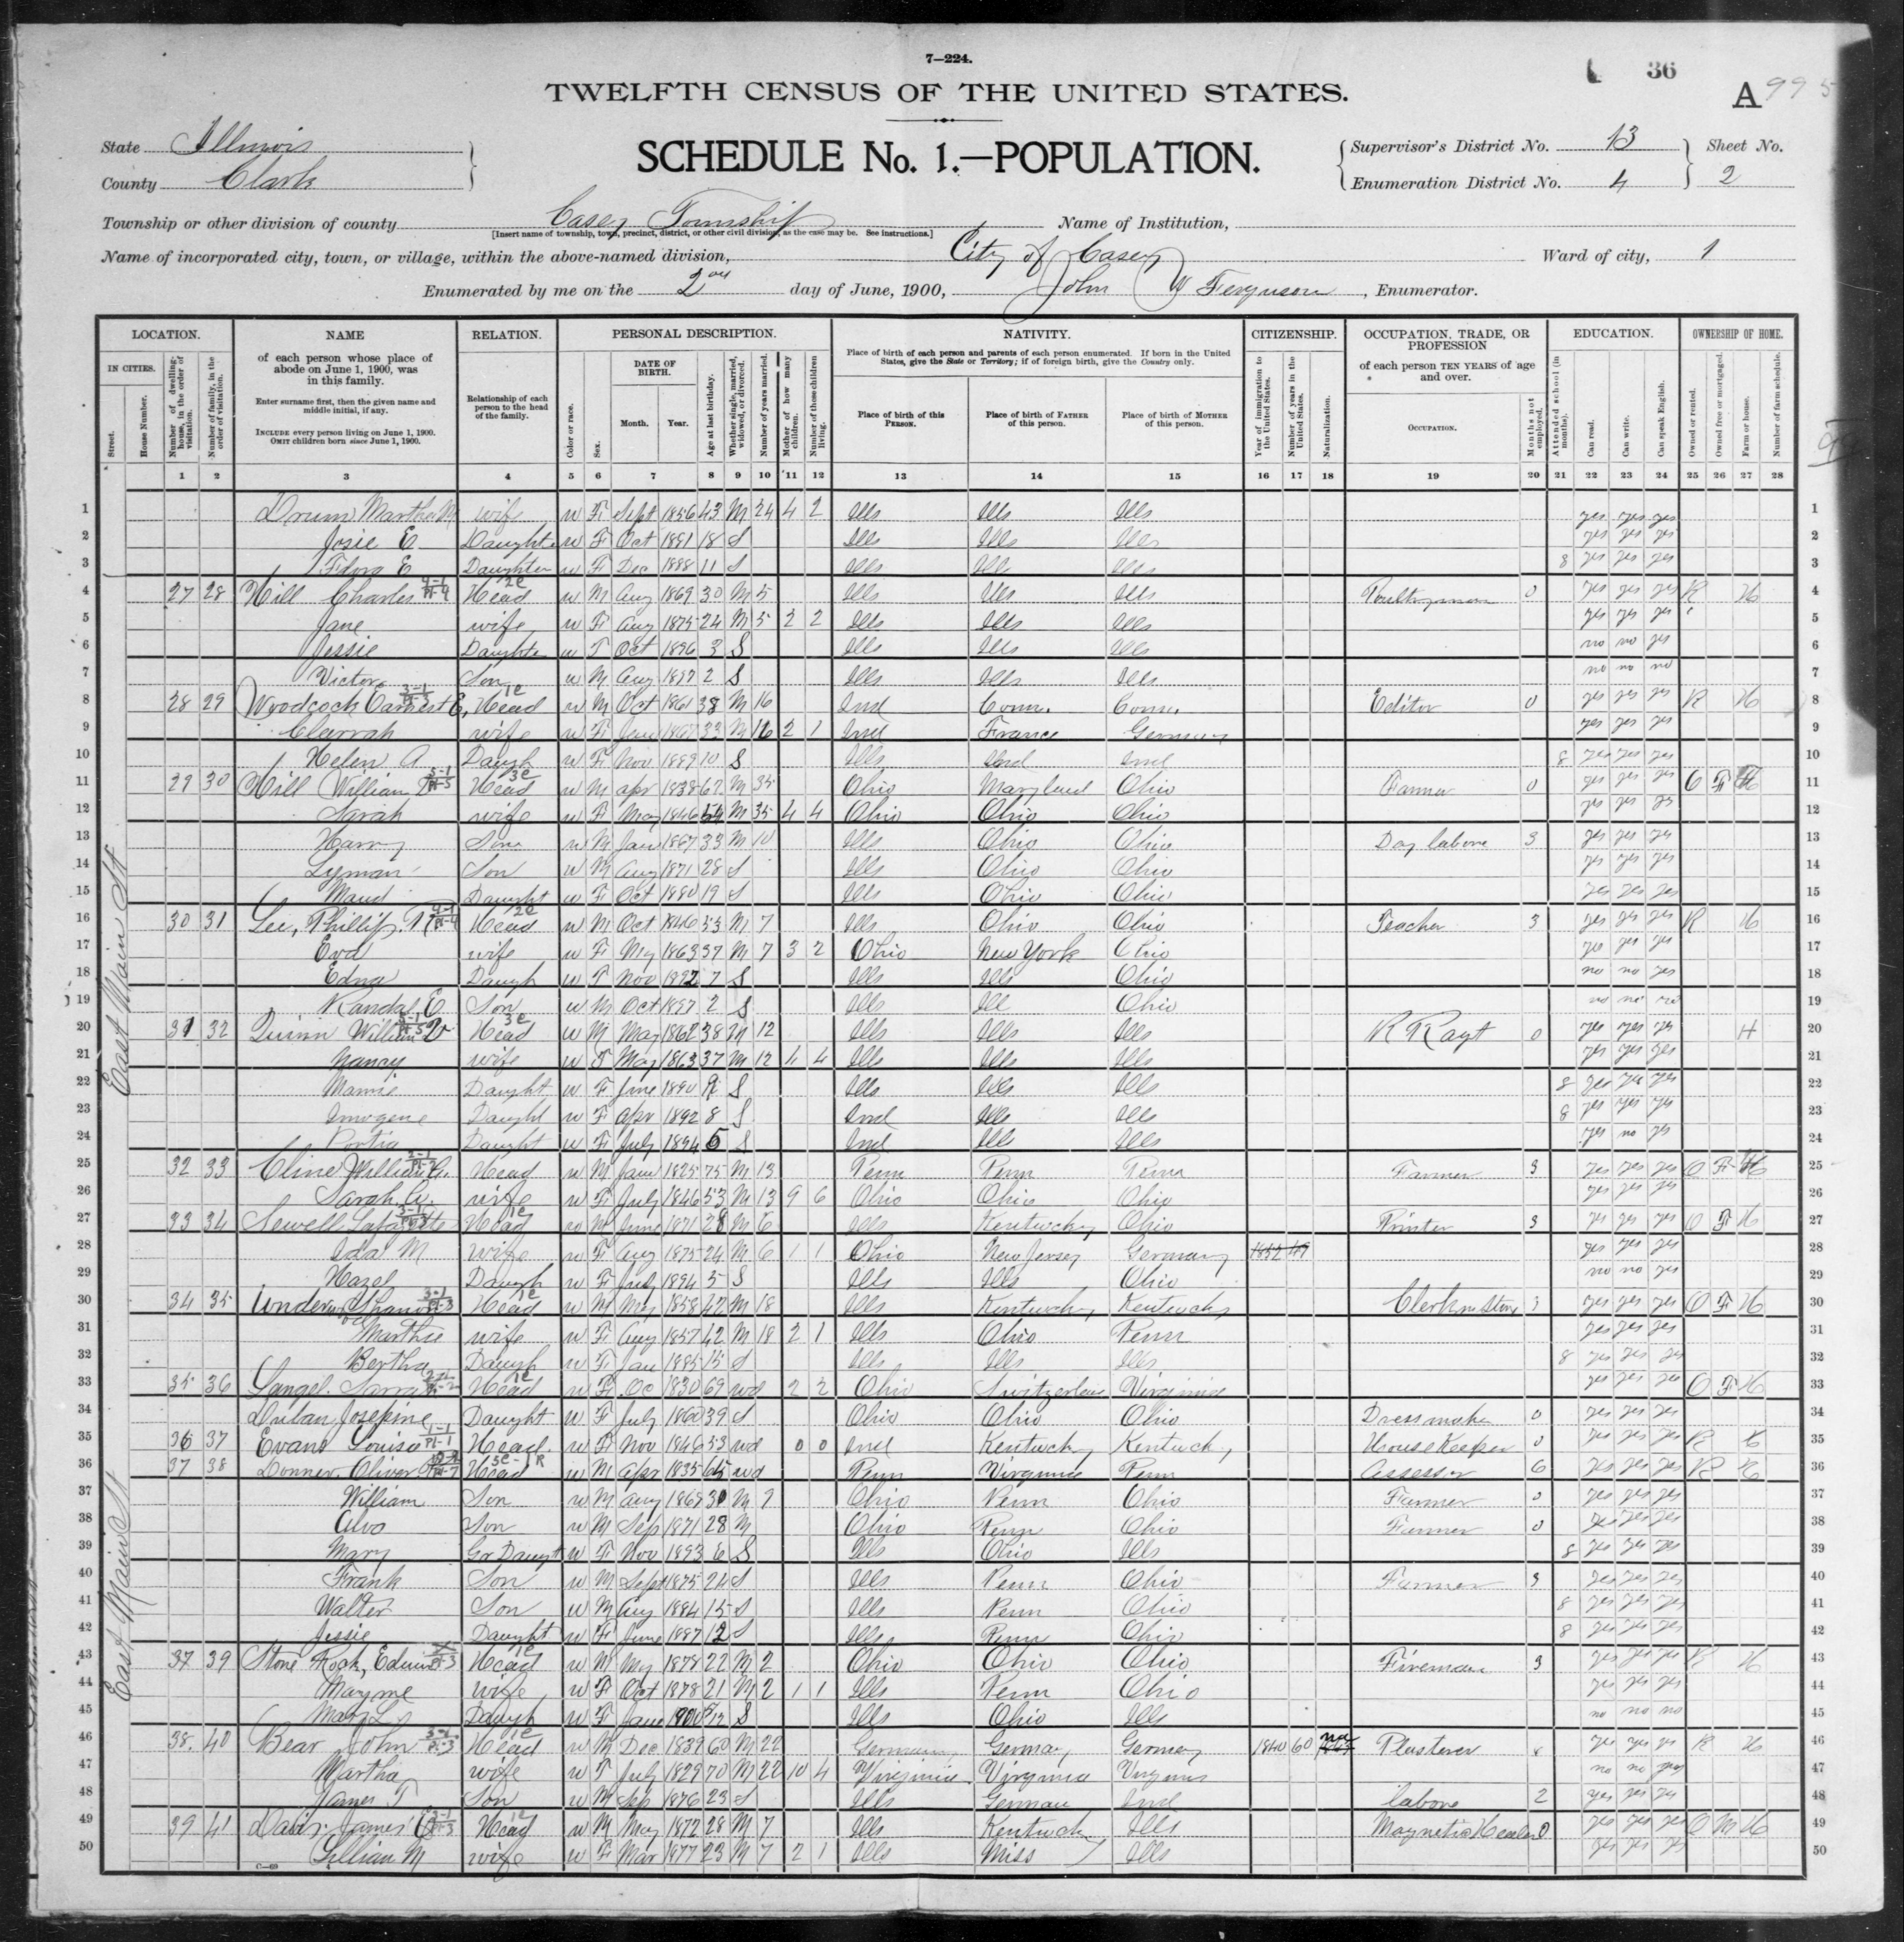 Illinois: CLARK County, Enumeration District 4, Sheet No. 2A